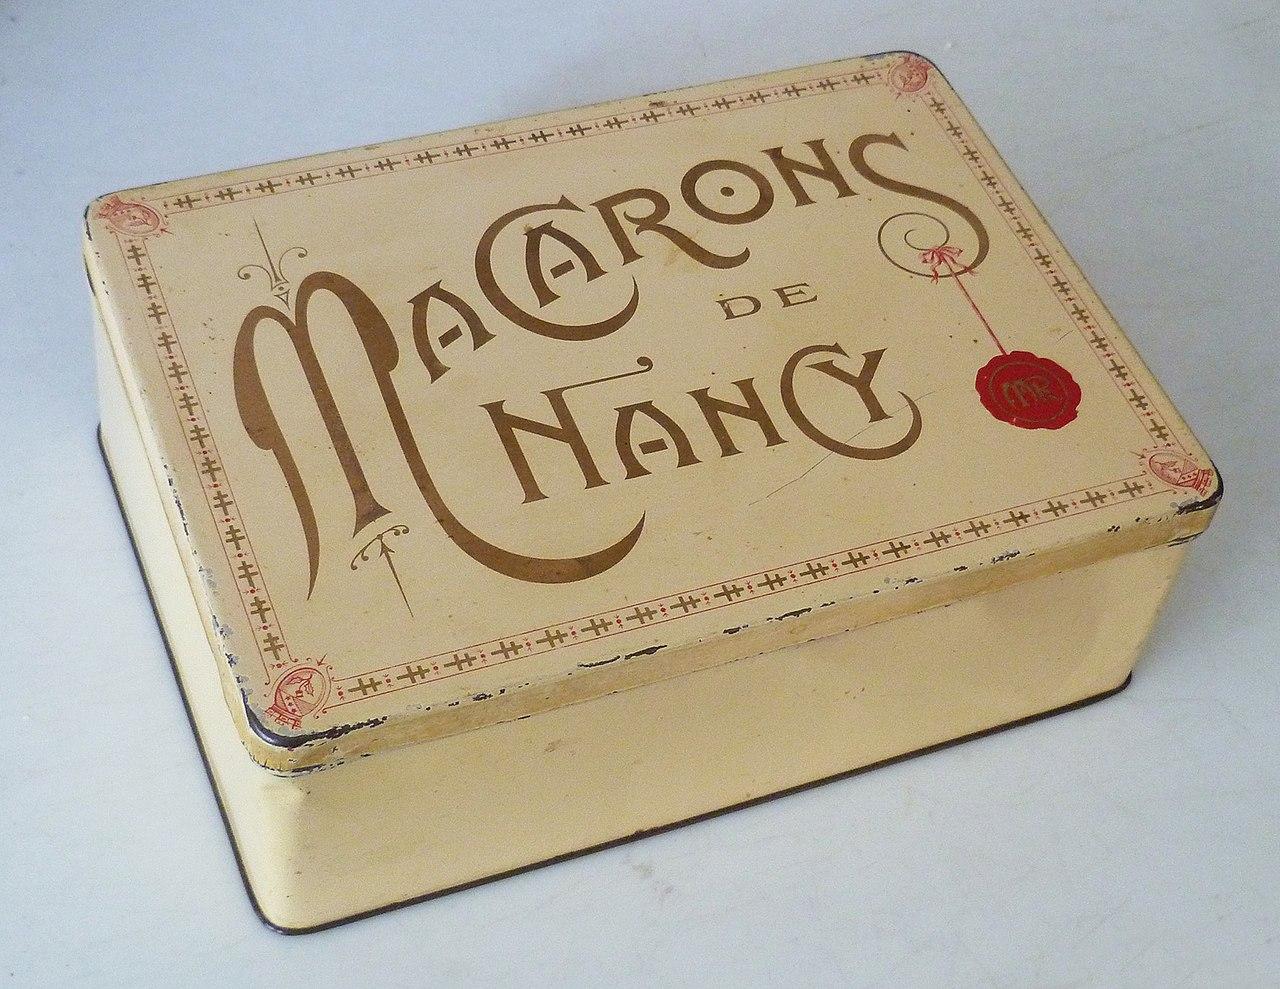 https://upload.wikimedia.org/wikipedia/commons/thumb/8/8e/Boite_de_macarons_de_Nancy_des_Magasins_R%C3%A9unis.jpg/1280px-Boite_de_macarons_de_Nancy_des_Magasins_R%C3%A9unis.jpg